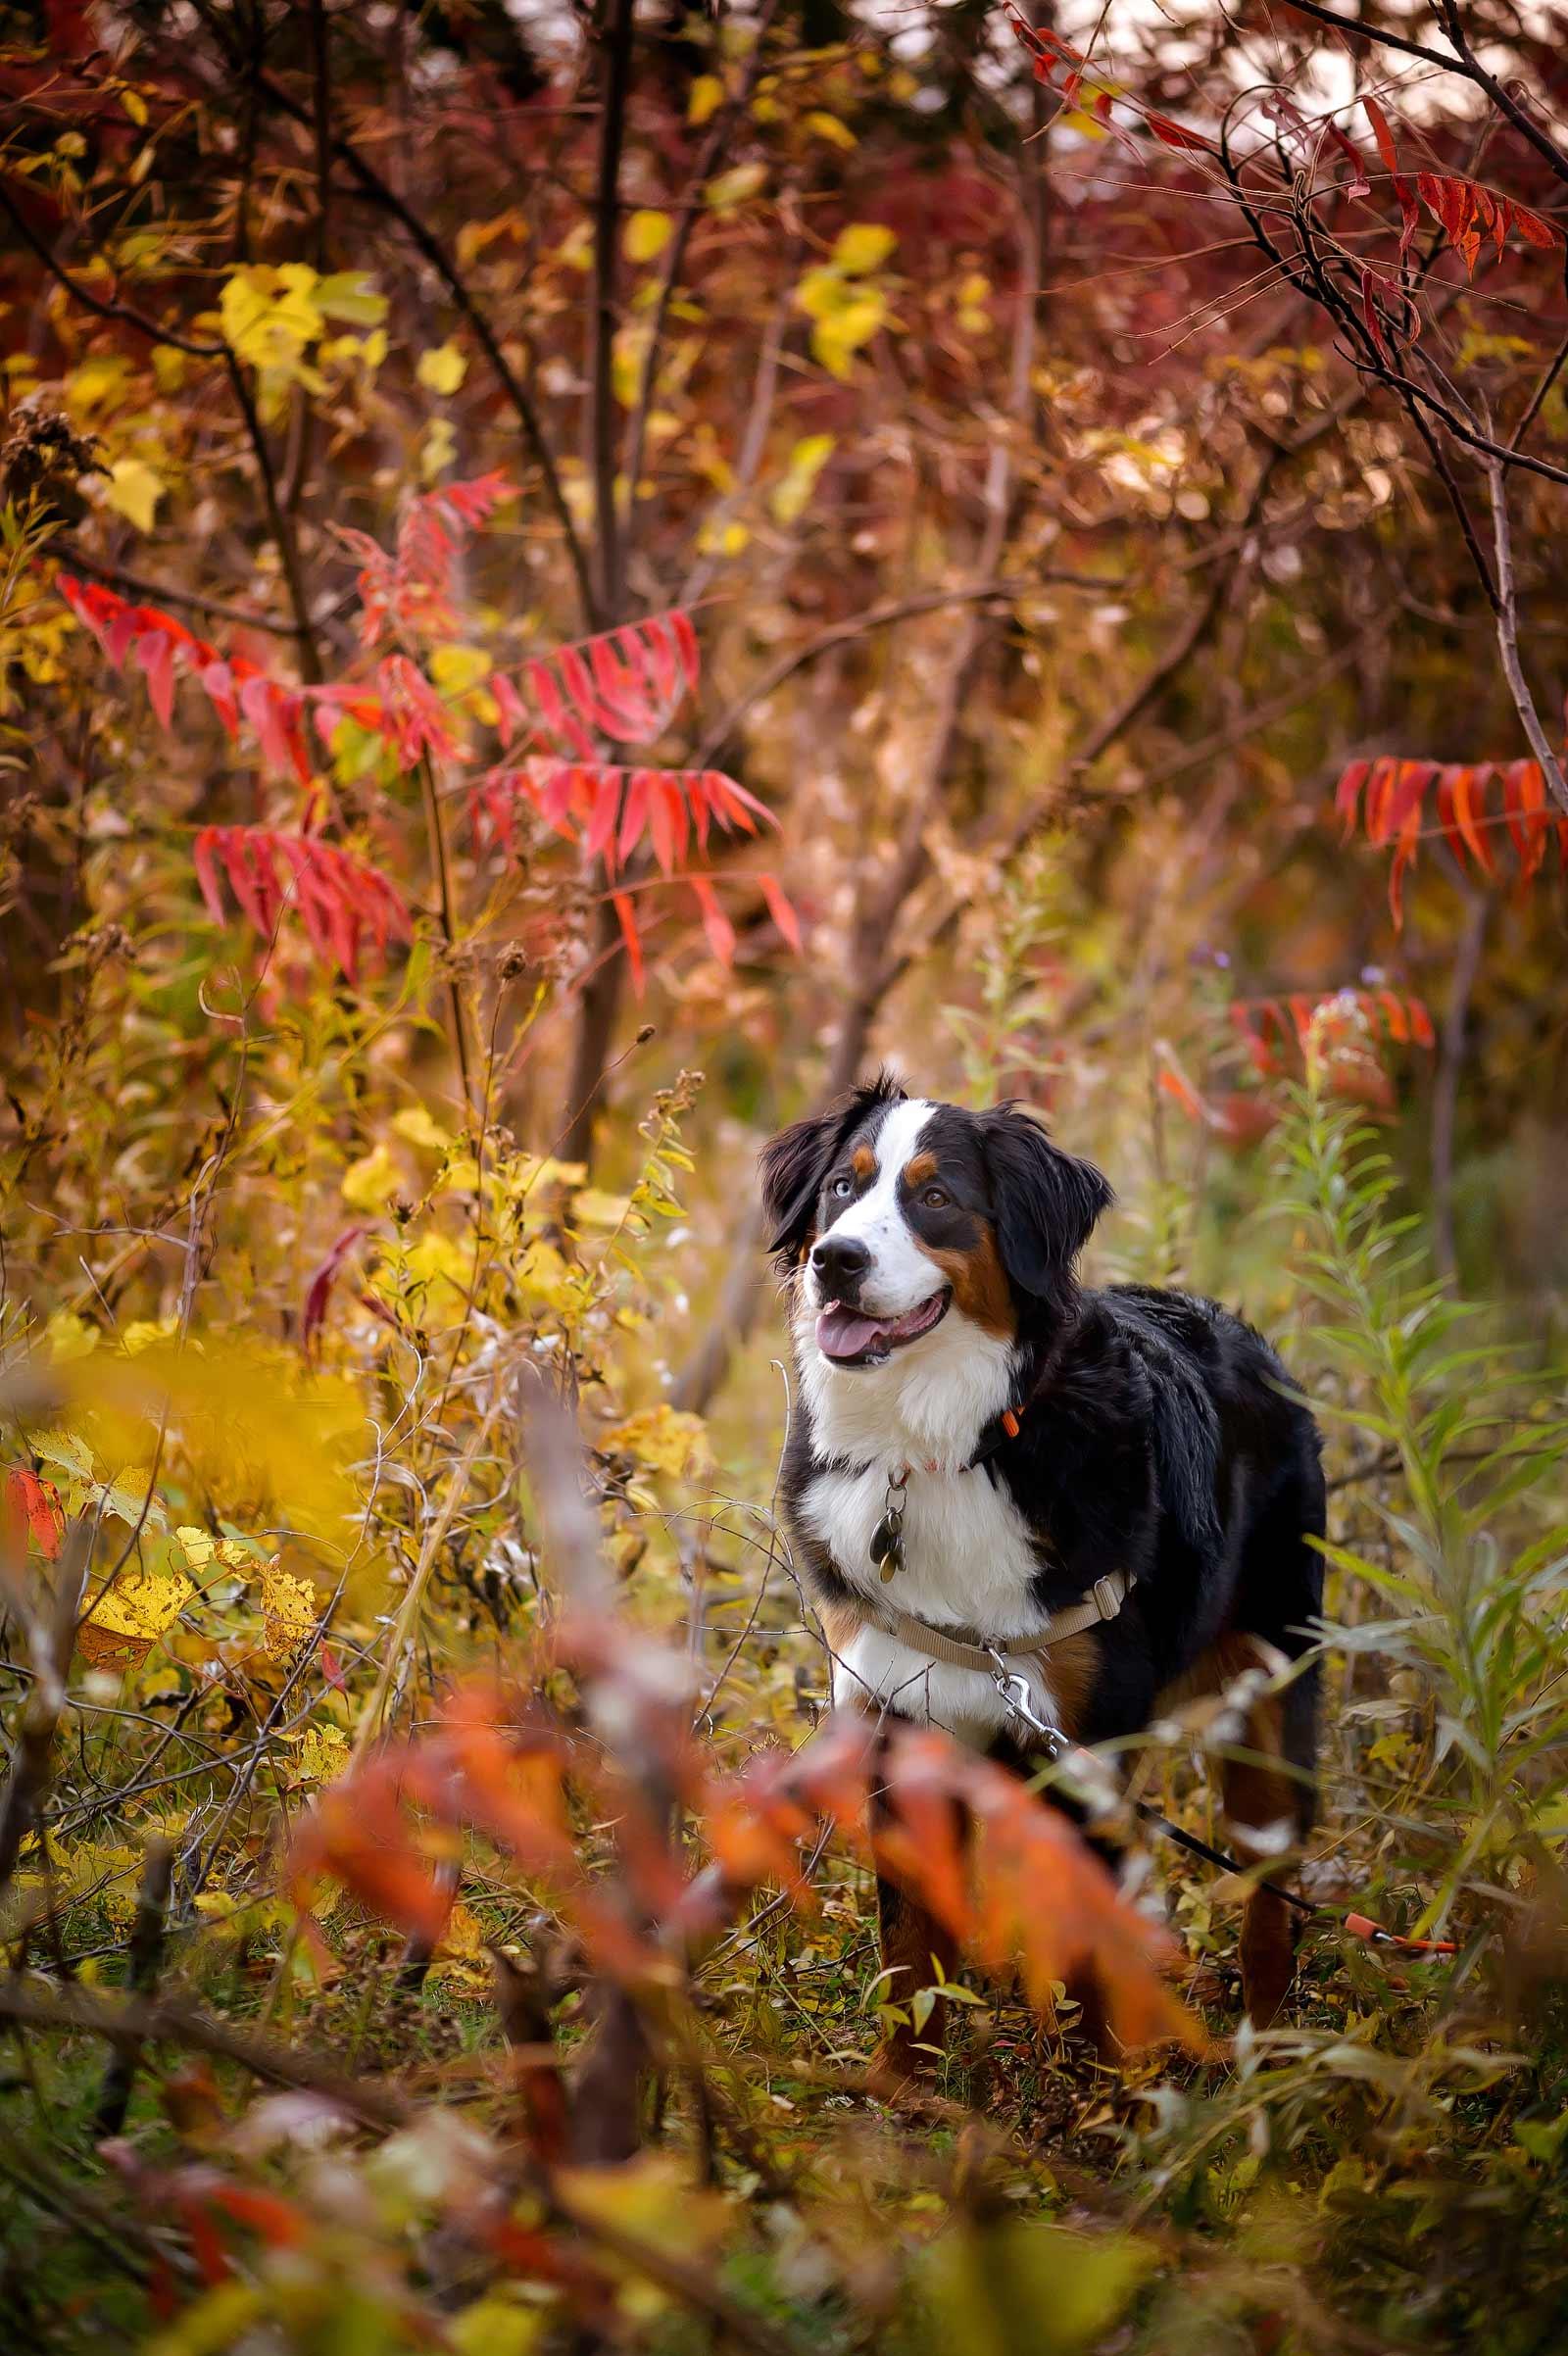 Ottawa Dog Photographer Princess Leia the Bernese mountain dog at Lemieux Island in the fall peeking through the trees